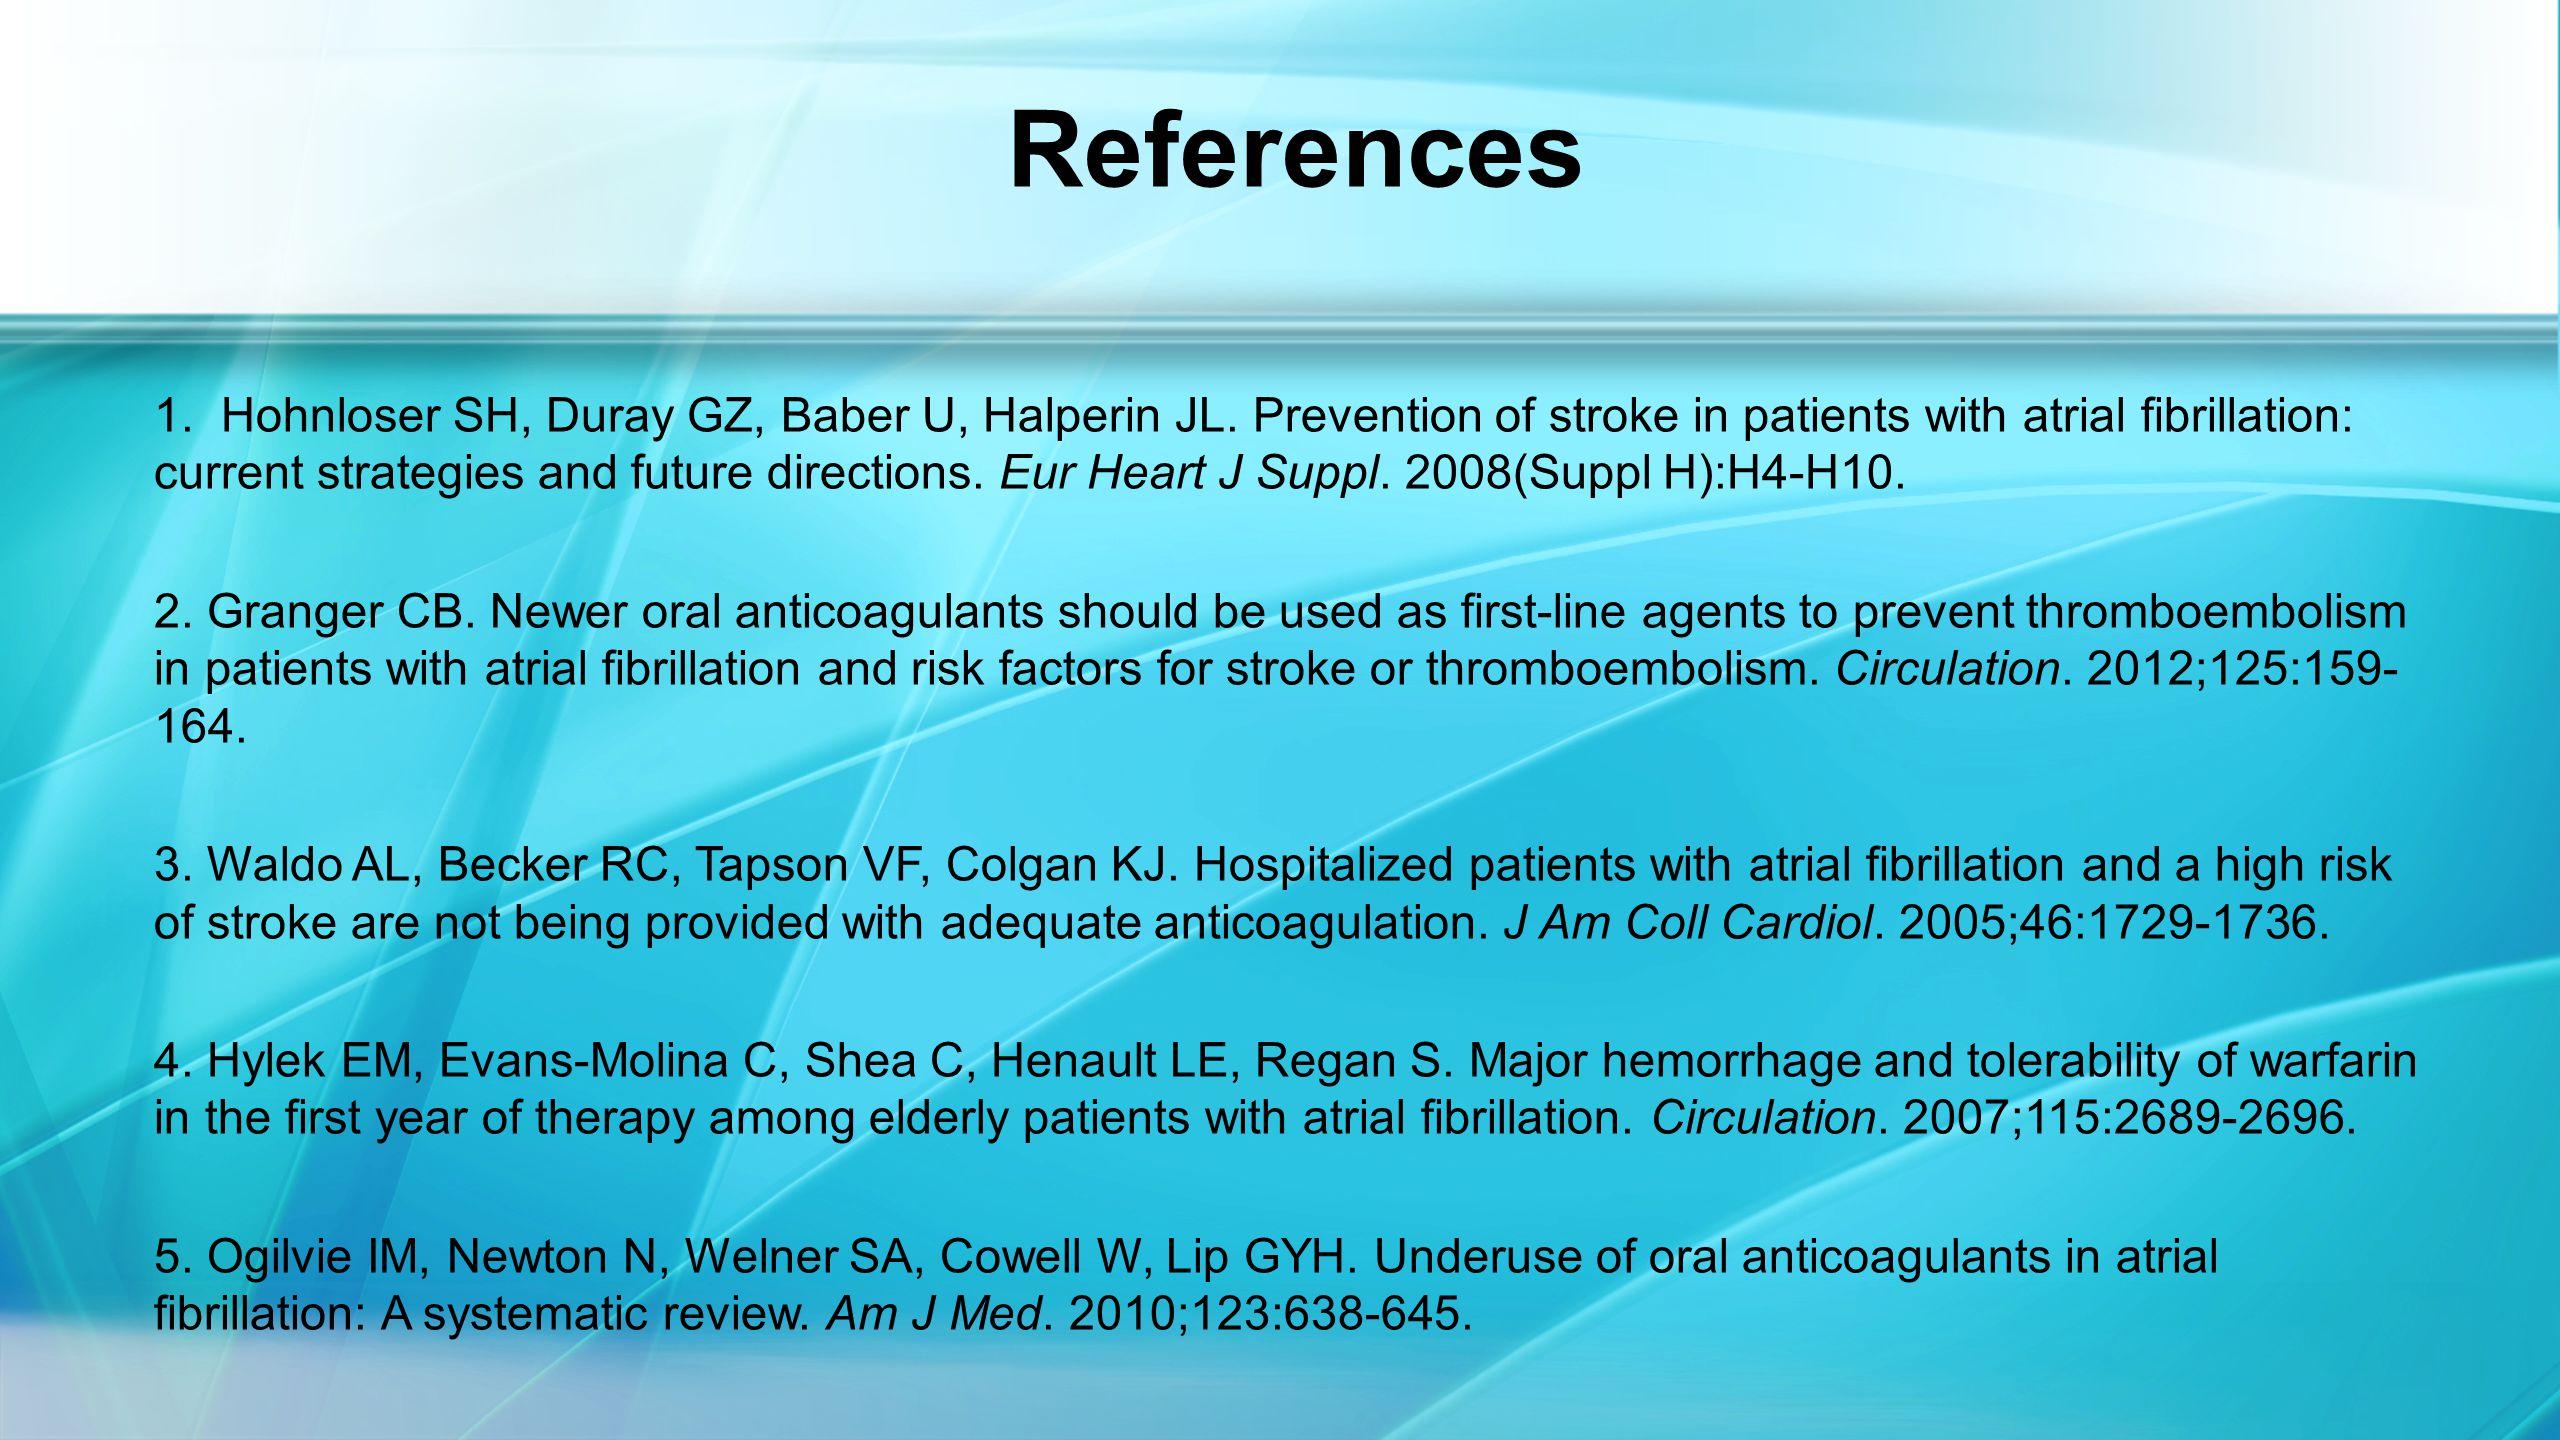 References 1. Hohnloser SH, Duray GZ, Baber U, Halperin JL.